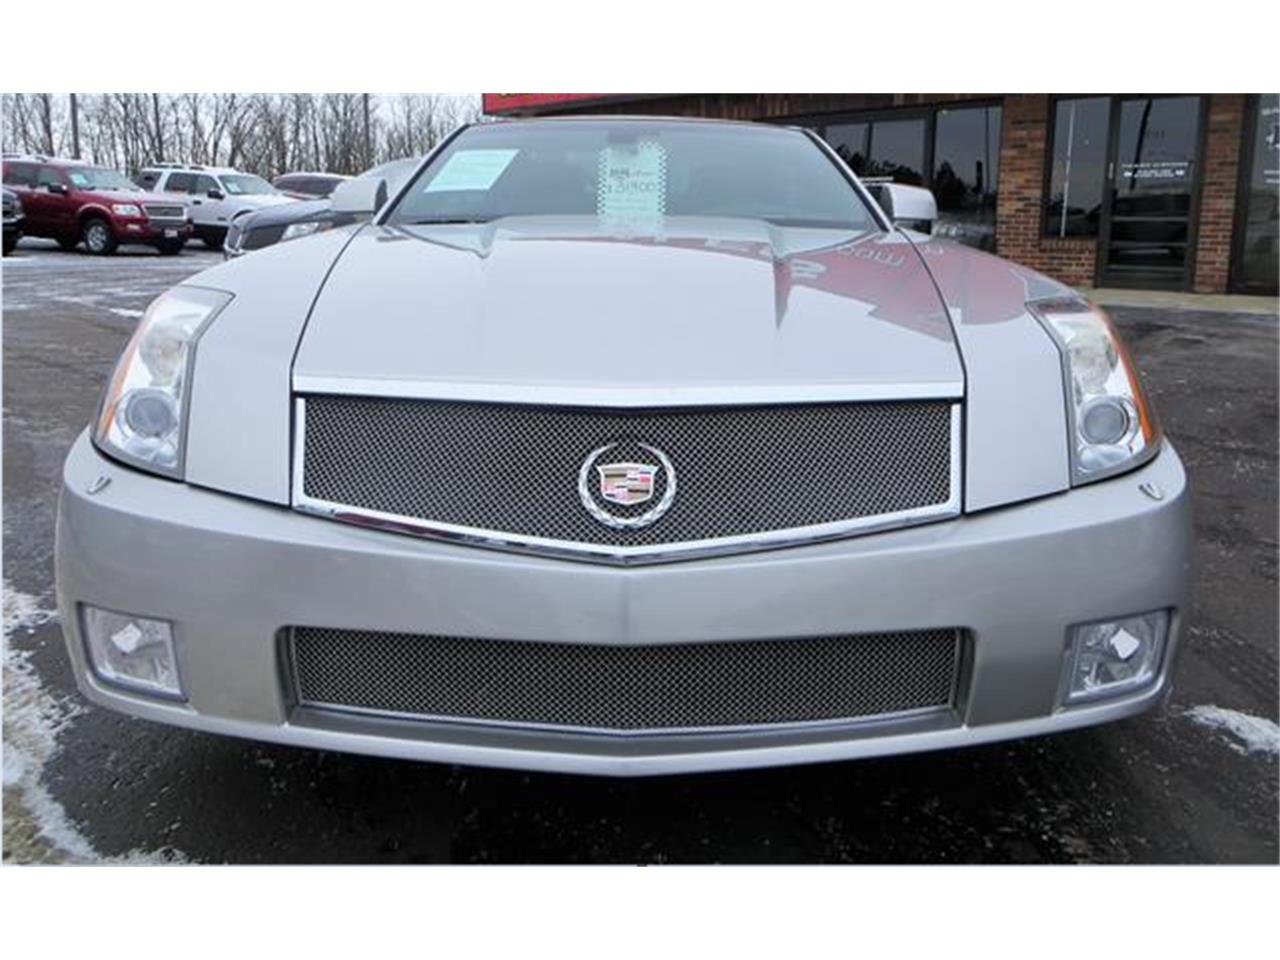 2006 Cadillac XLR-V for Sale   ClassicCars.com   CC-956531